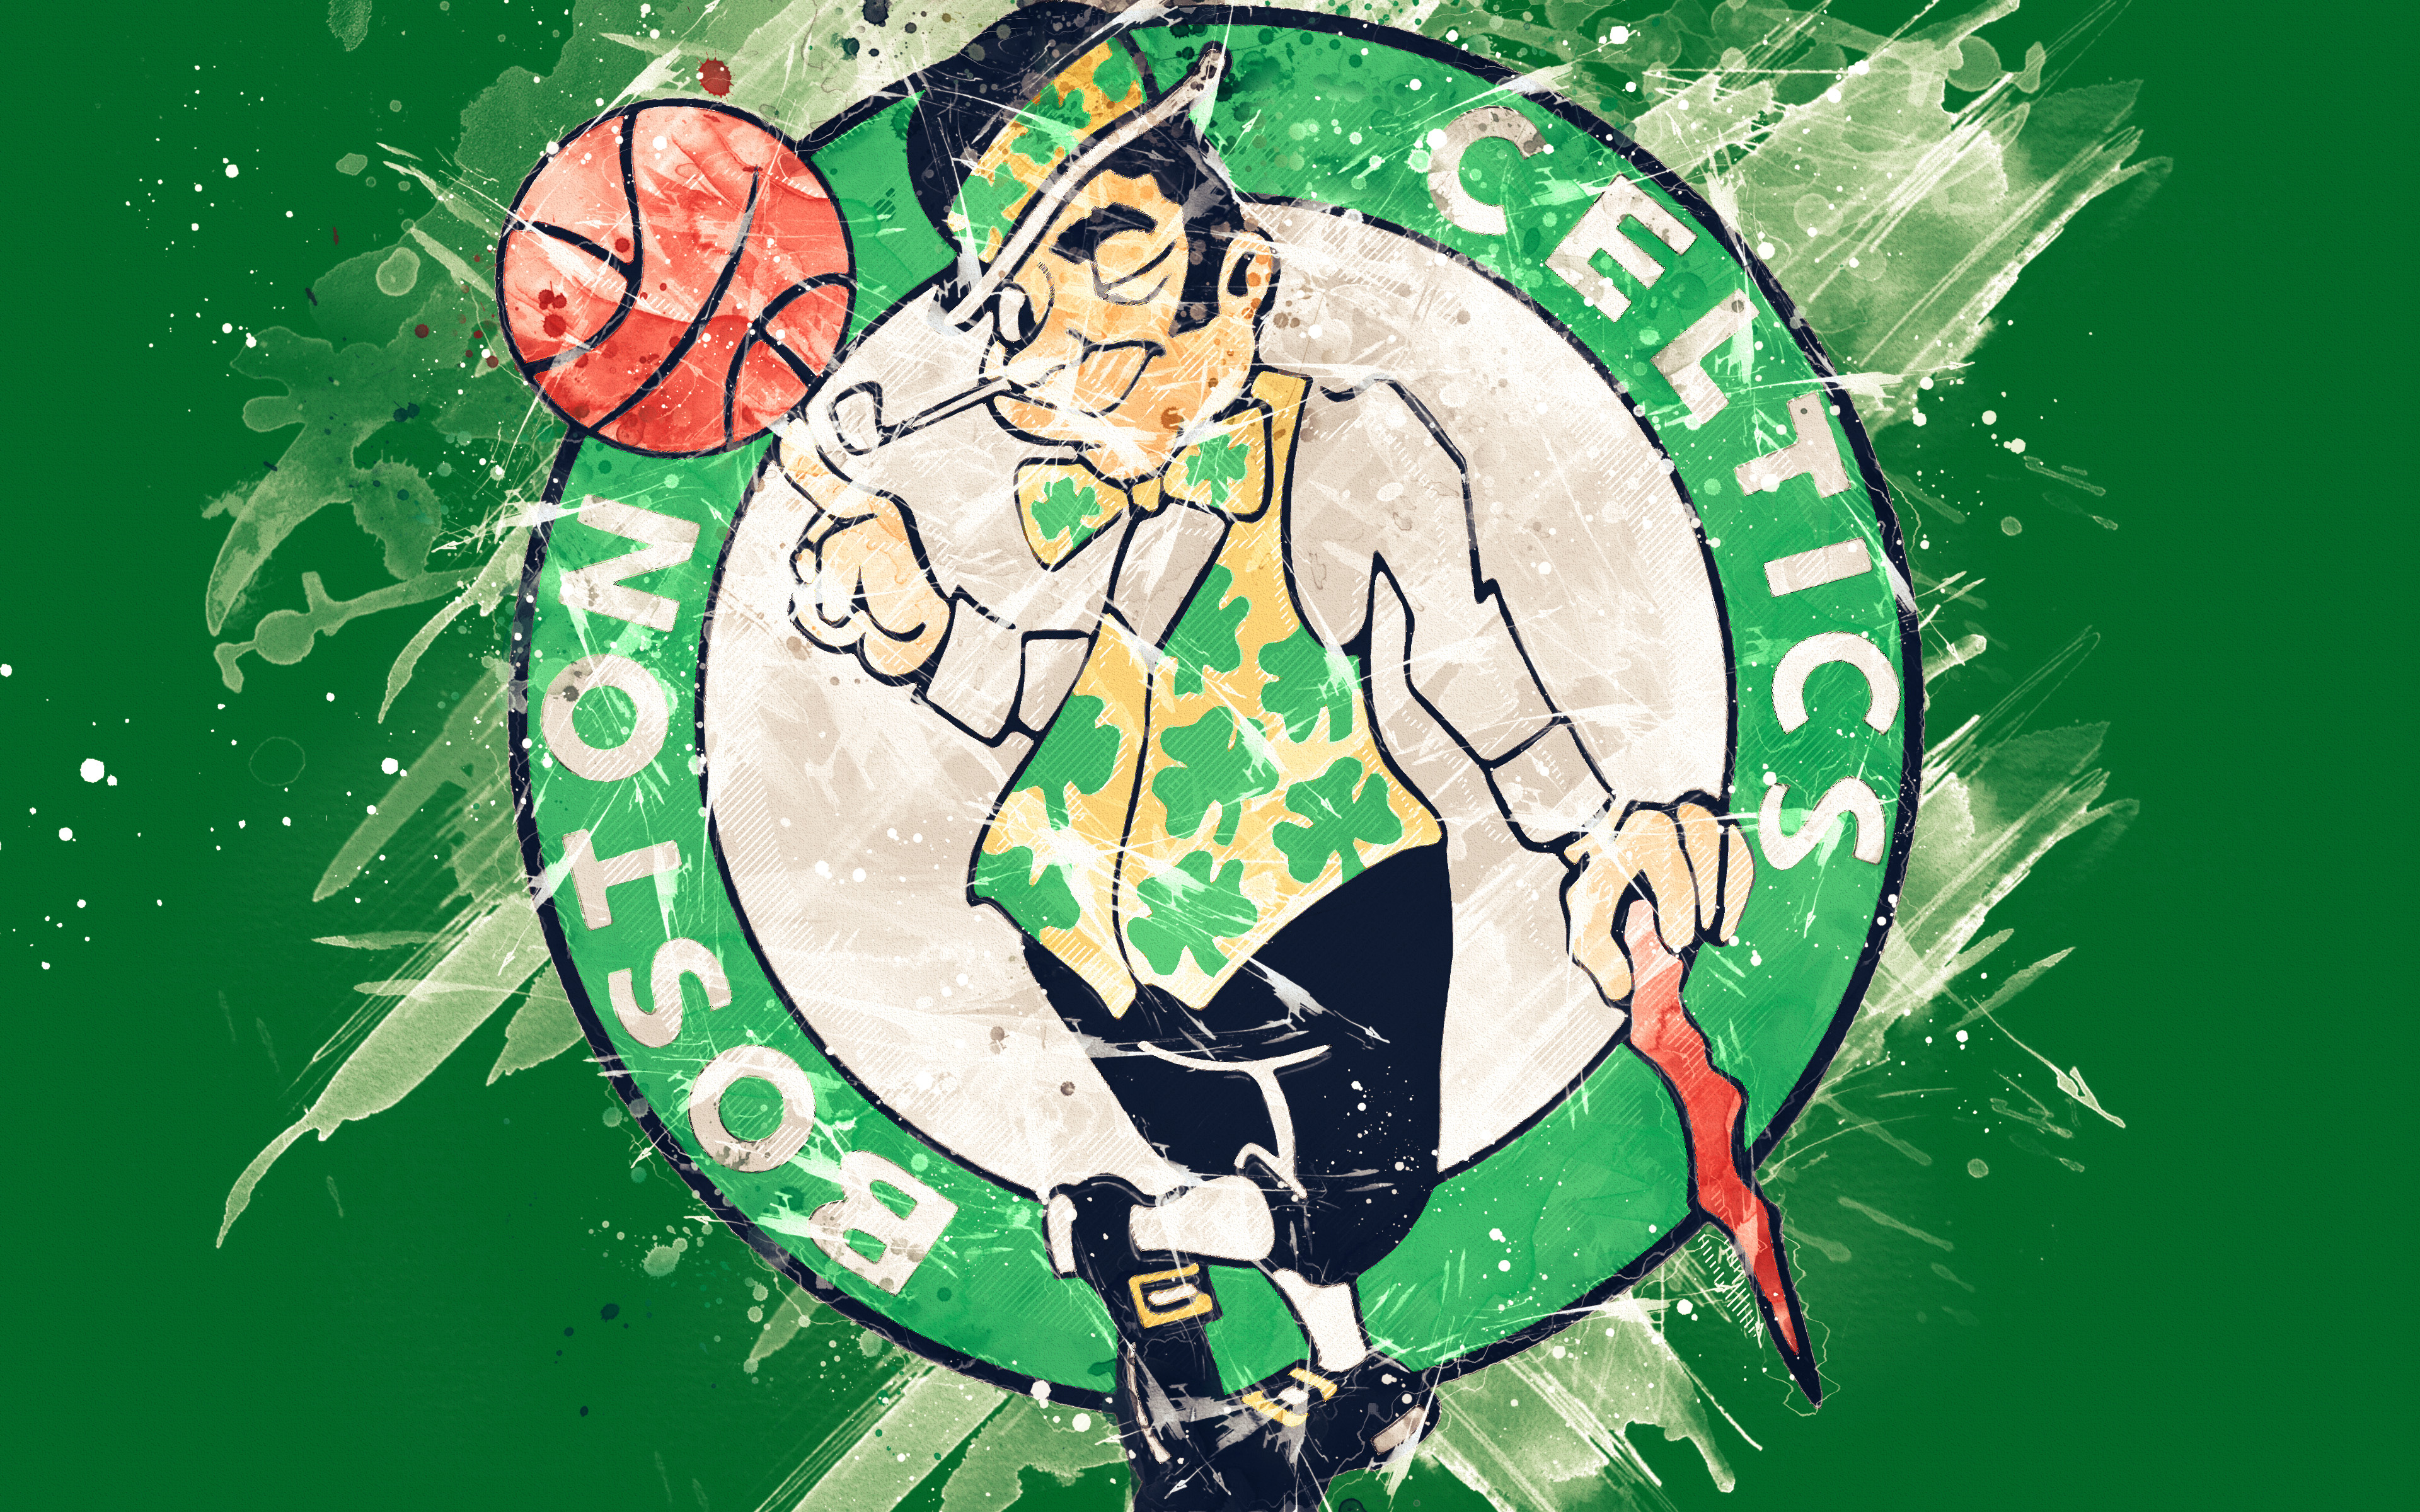 Boston Celtics Logo 4k Ultra Hd Wallpaper Background Image 3840x2400 Id 971328 Wallpaper Abyss